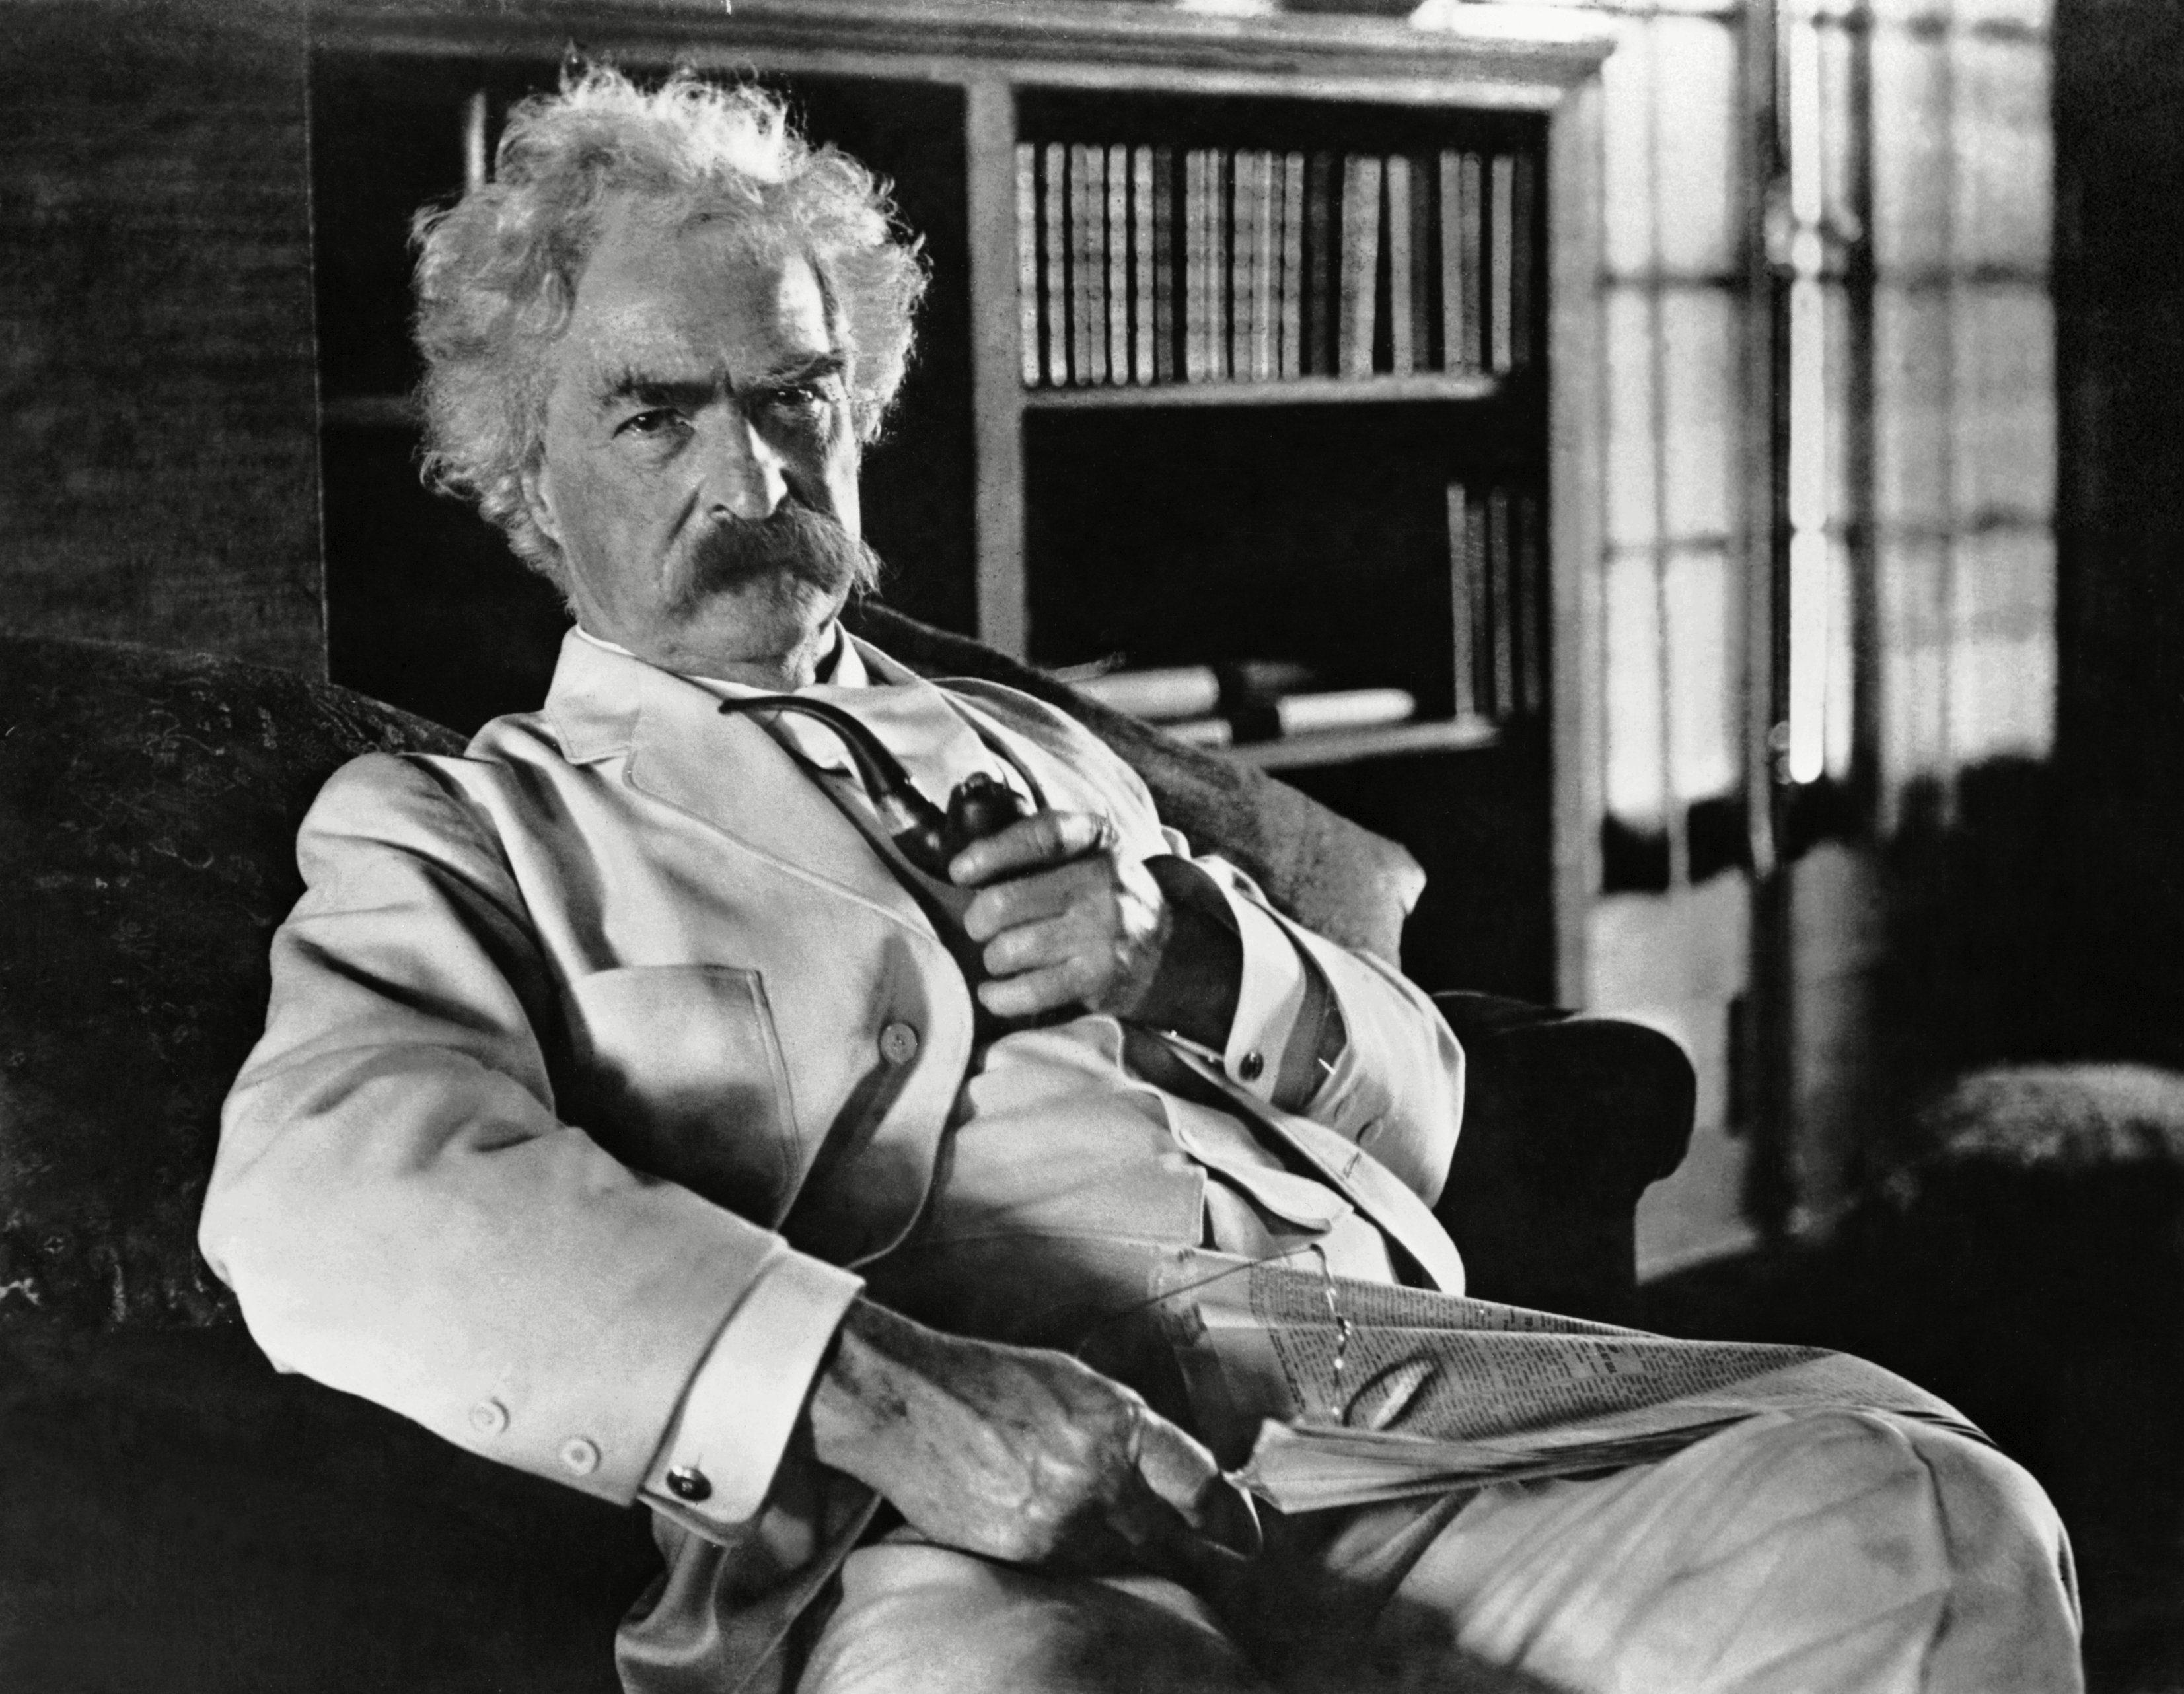 Mandatory Credit: Photo by Ewing Galloway/Uig/Shutterstock (3799656a) Novelist Mark Twain VARIOUS